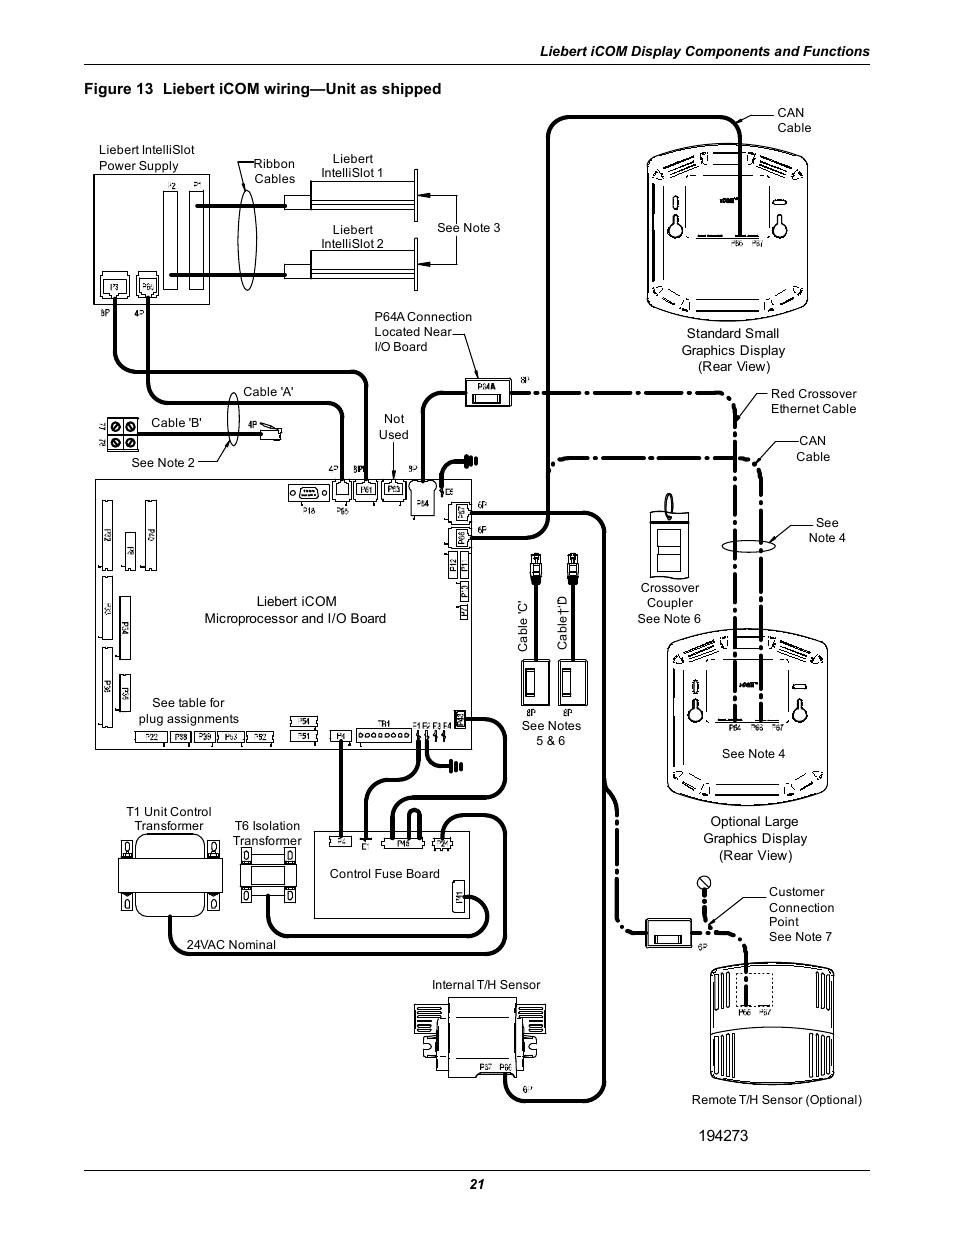 71 Challenger Wiring Diagram Get Free Image About Wiring Diagram